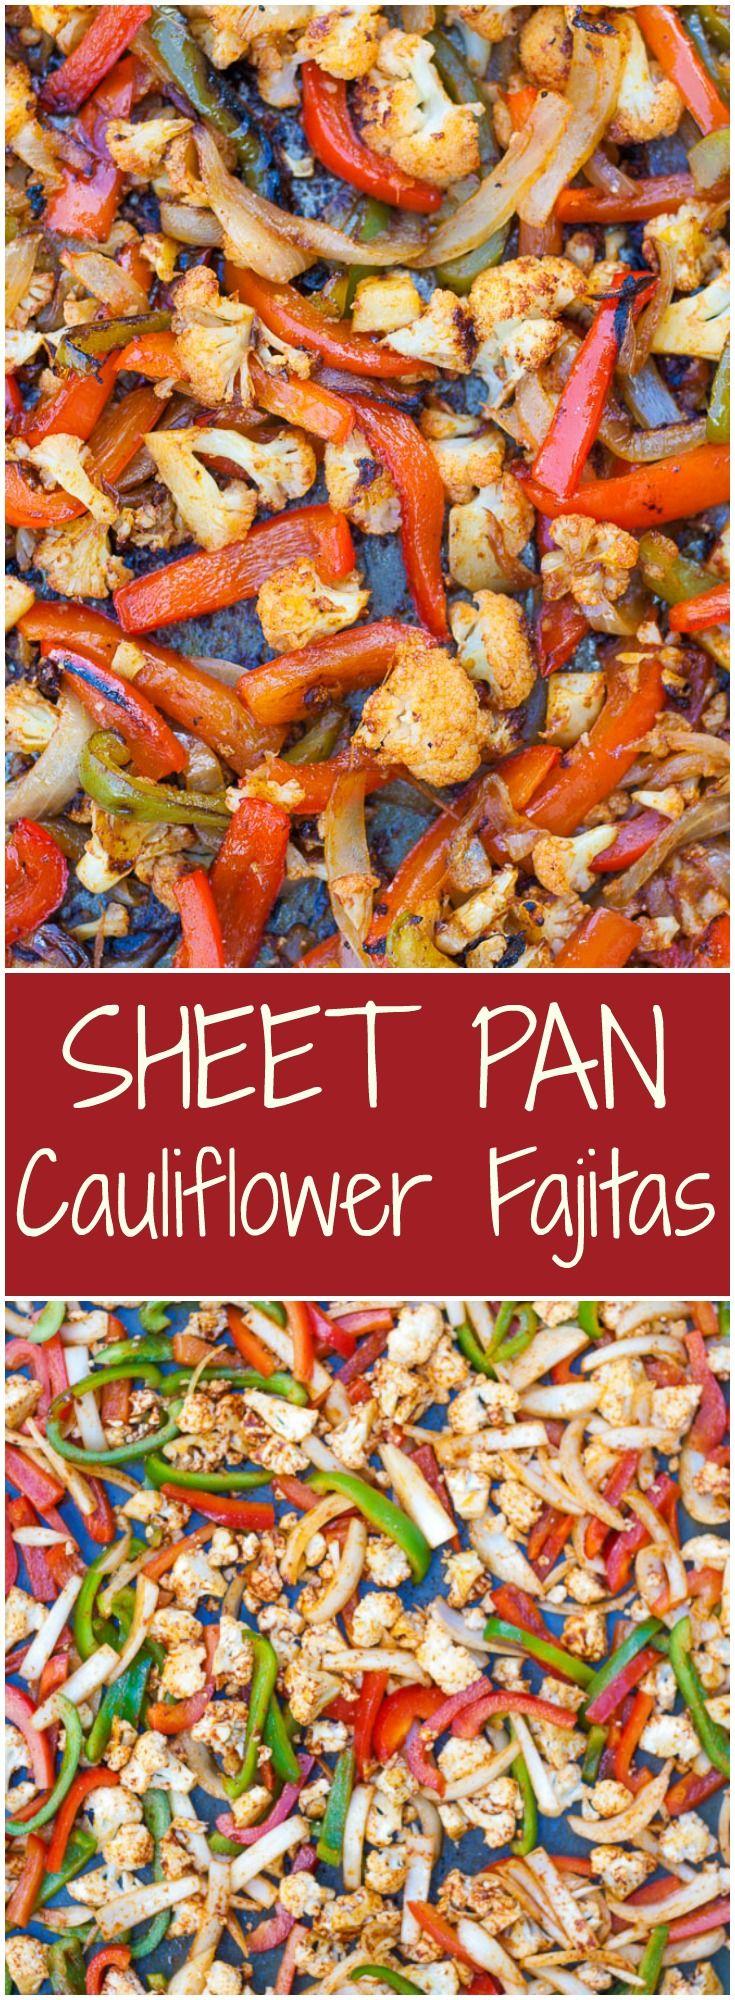 Vegan/Gluten free SHEET PAN Cauliflower Fajitas.